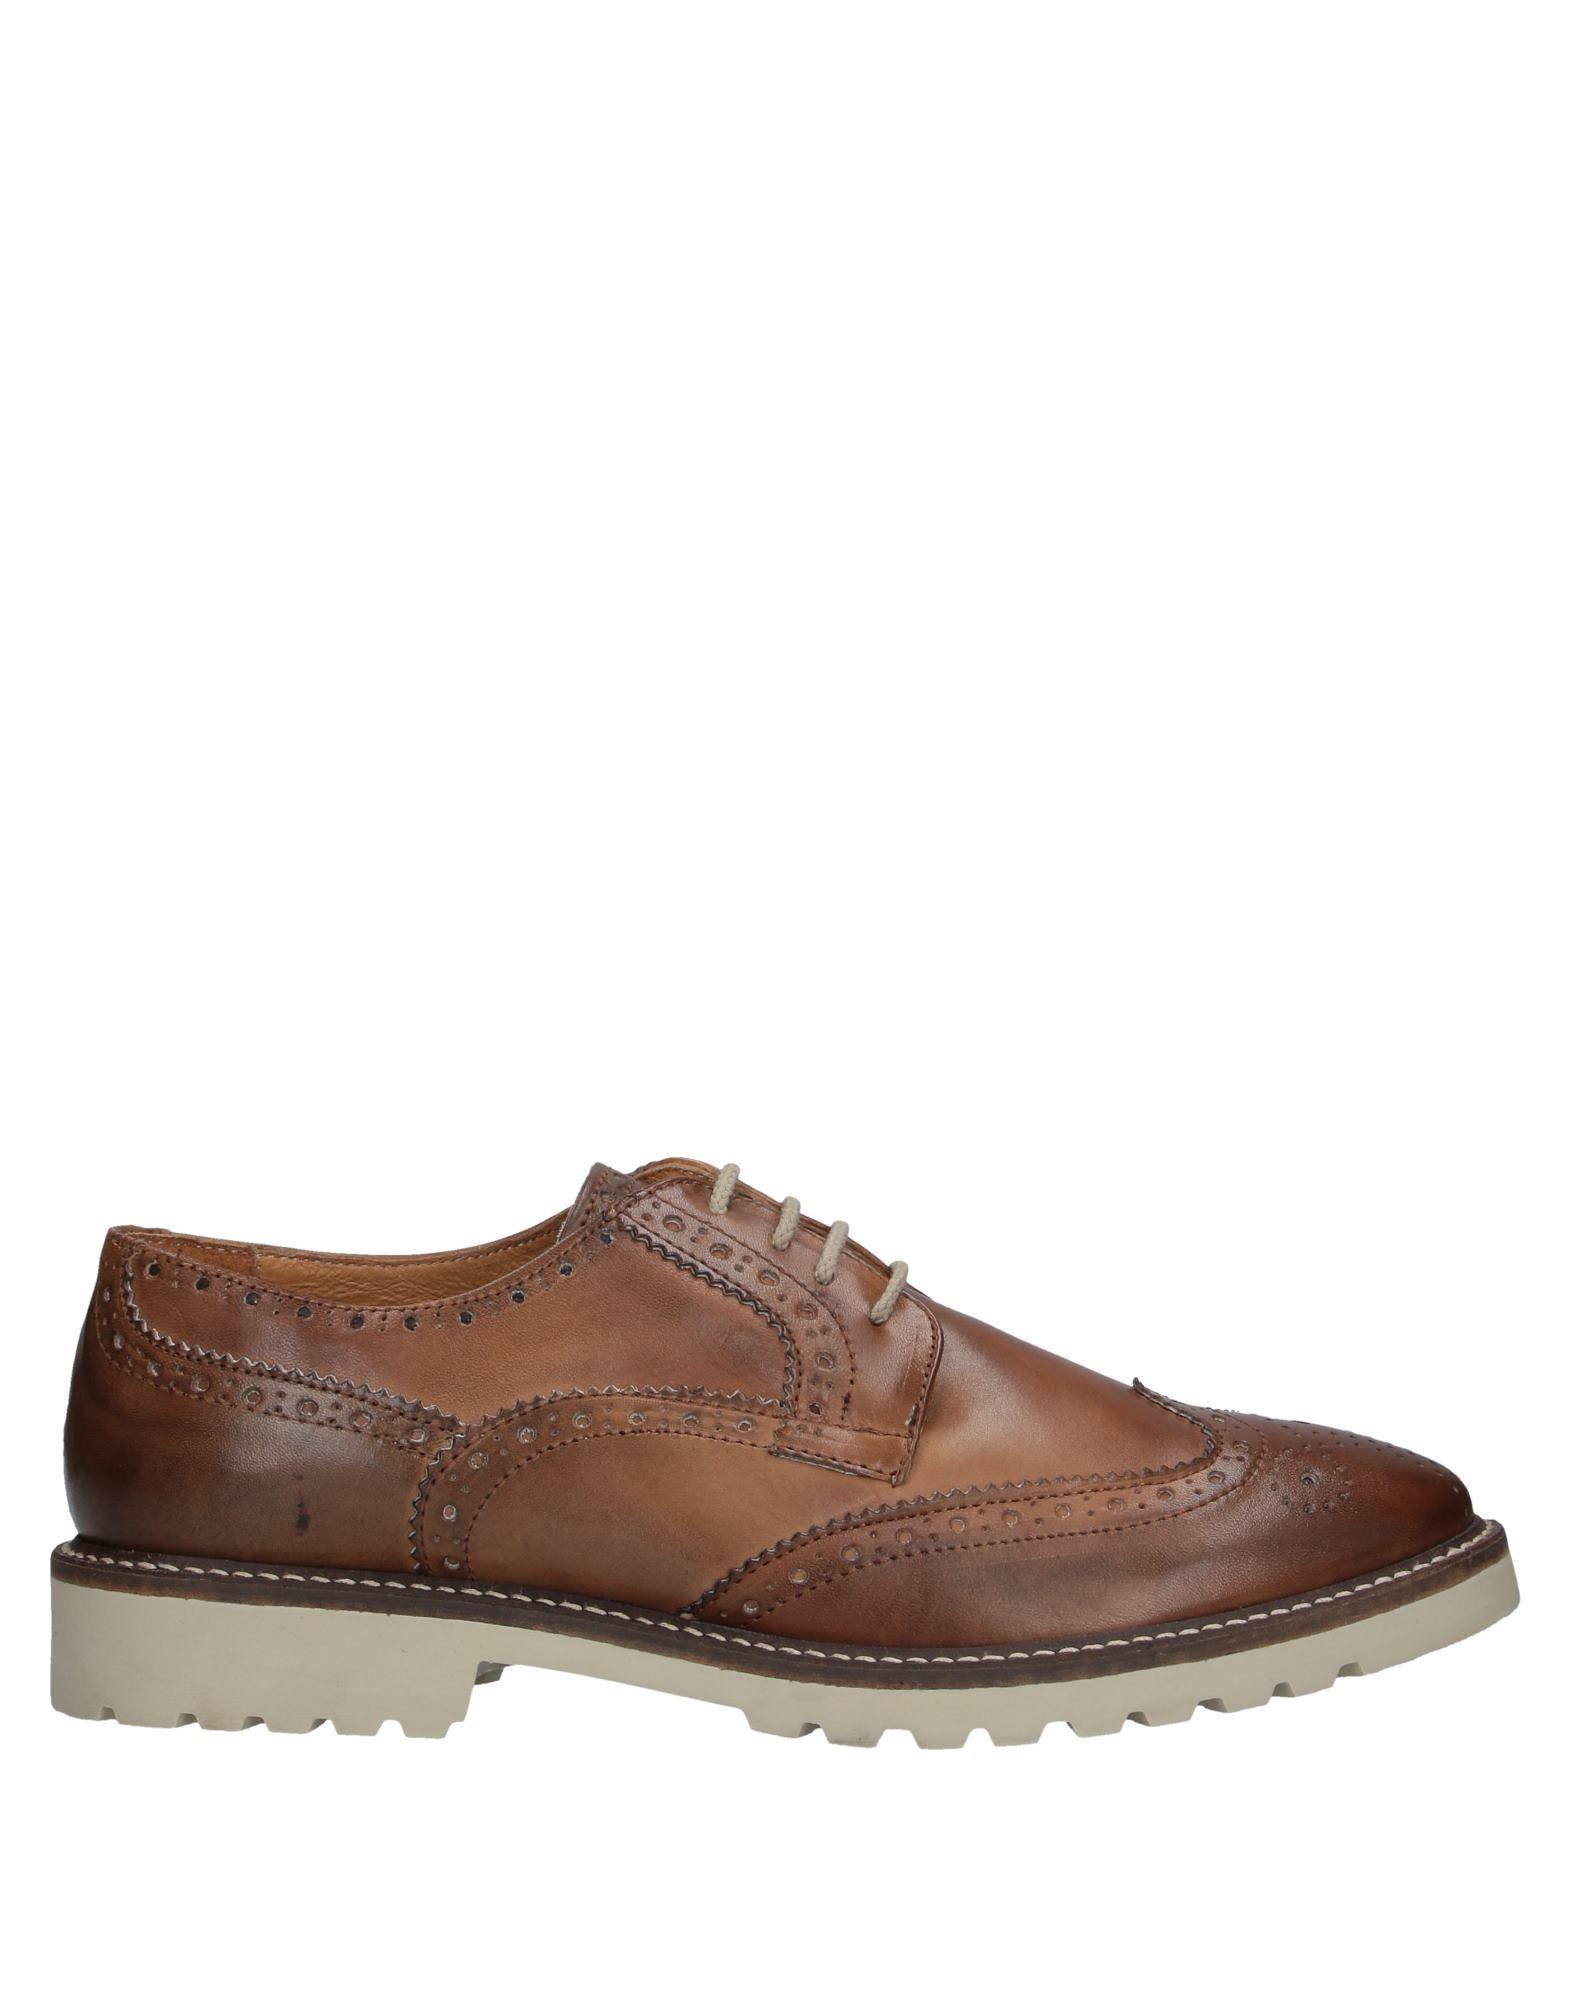 ALEXANDER TREND Обувь на шнурках